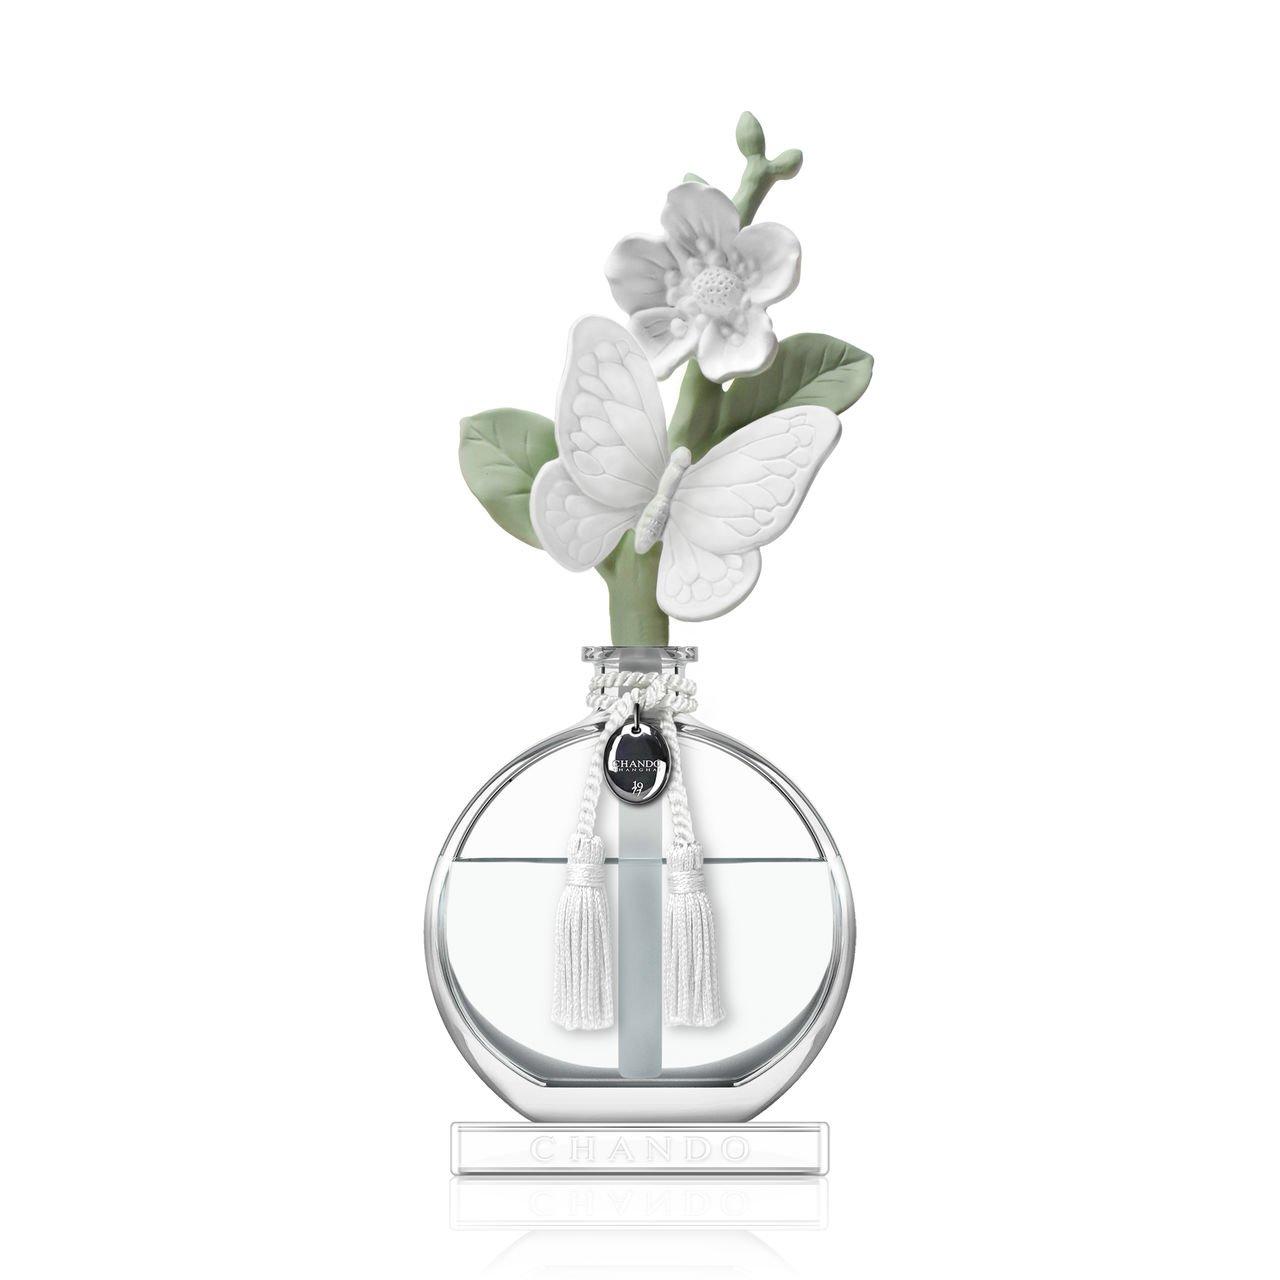 Chando Fantasy Collection Aroma Porcelain Diffuser Apple Blossom 100ml